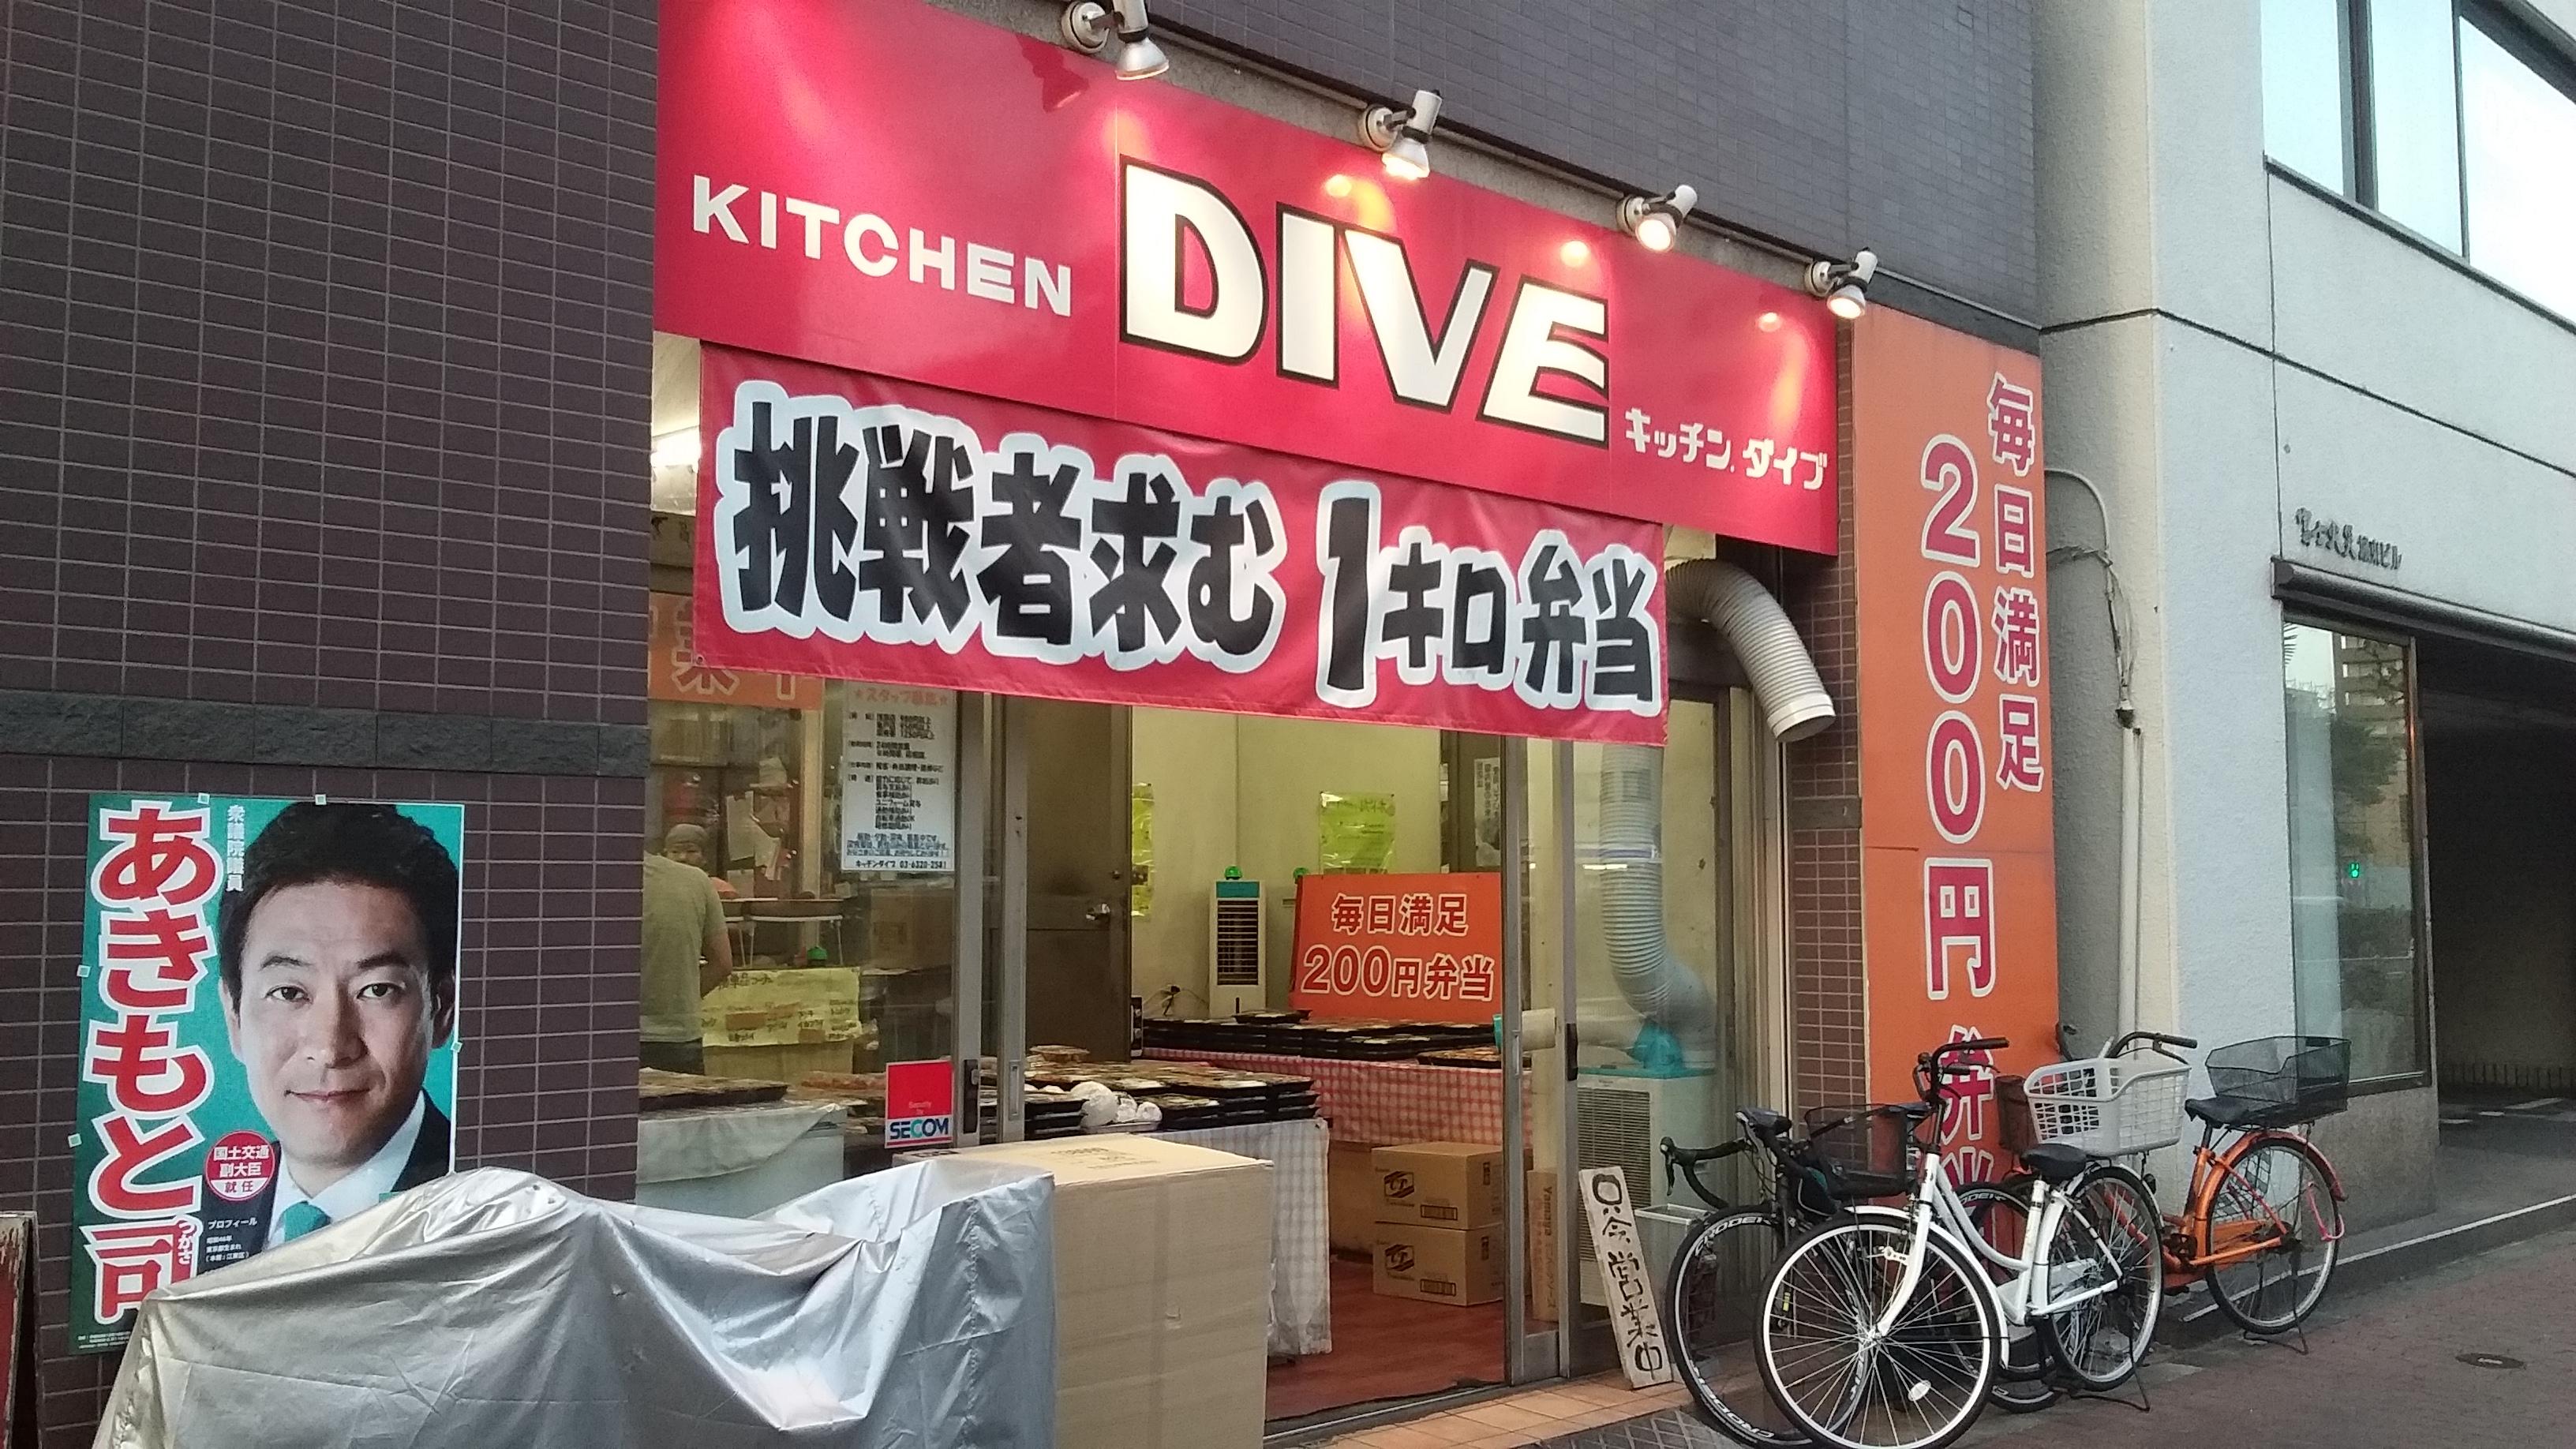 wpid 20170908 173526 亀戸駅のおすすめお弁当屋さん